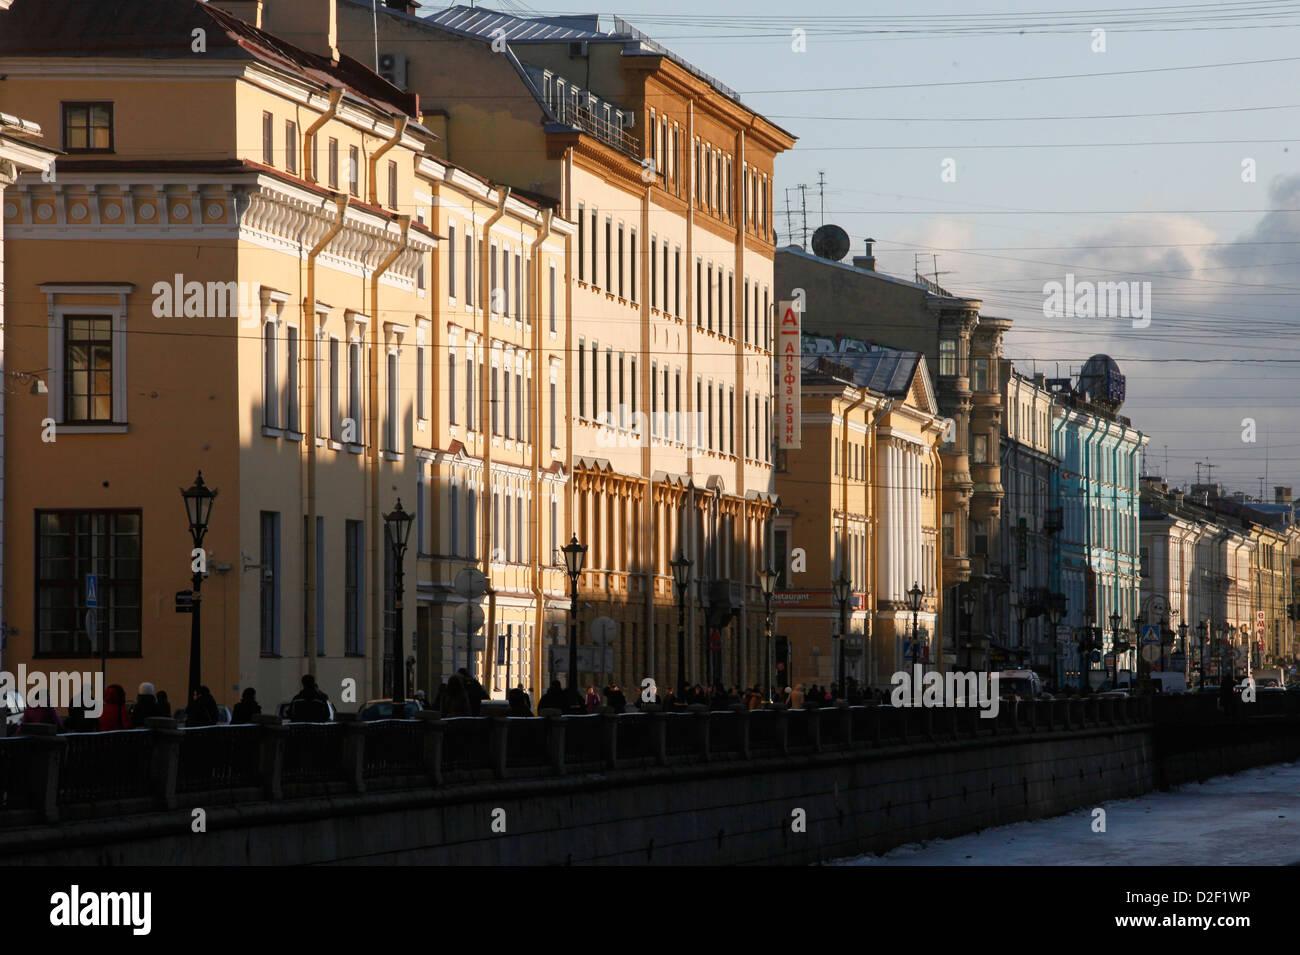 Griboedov Canal. Saint Petersburg. Russia. - Stock Image